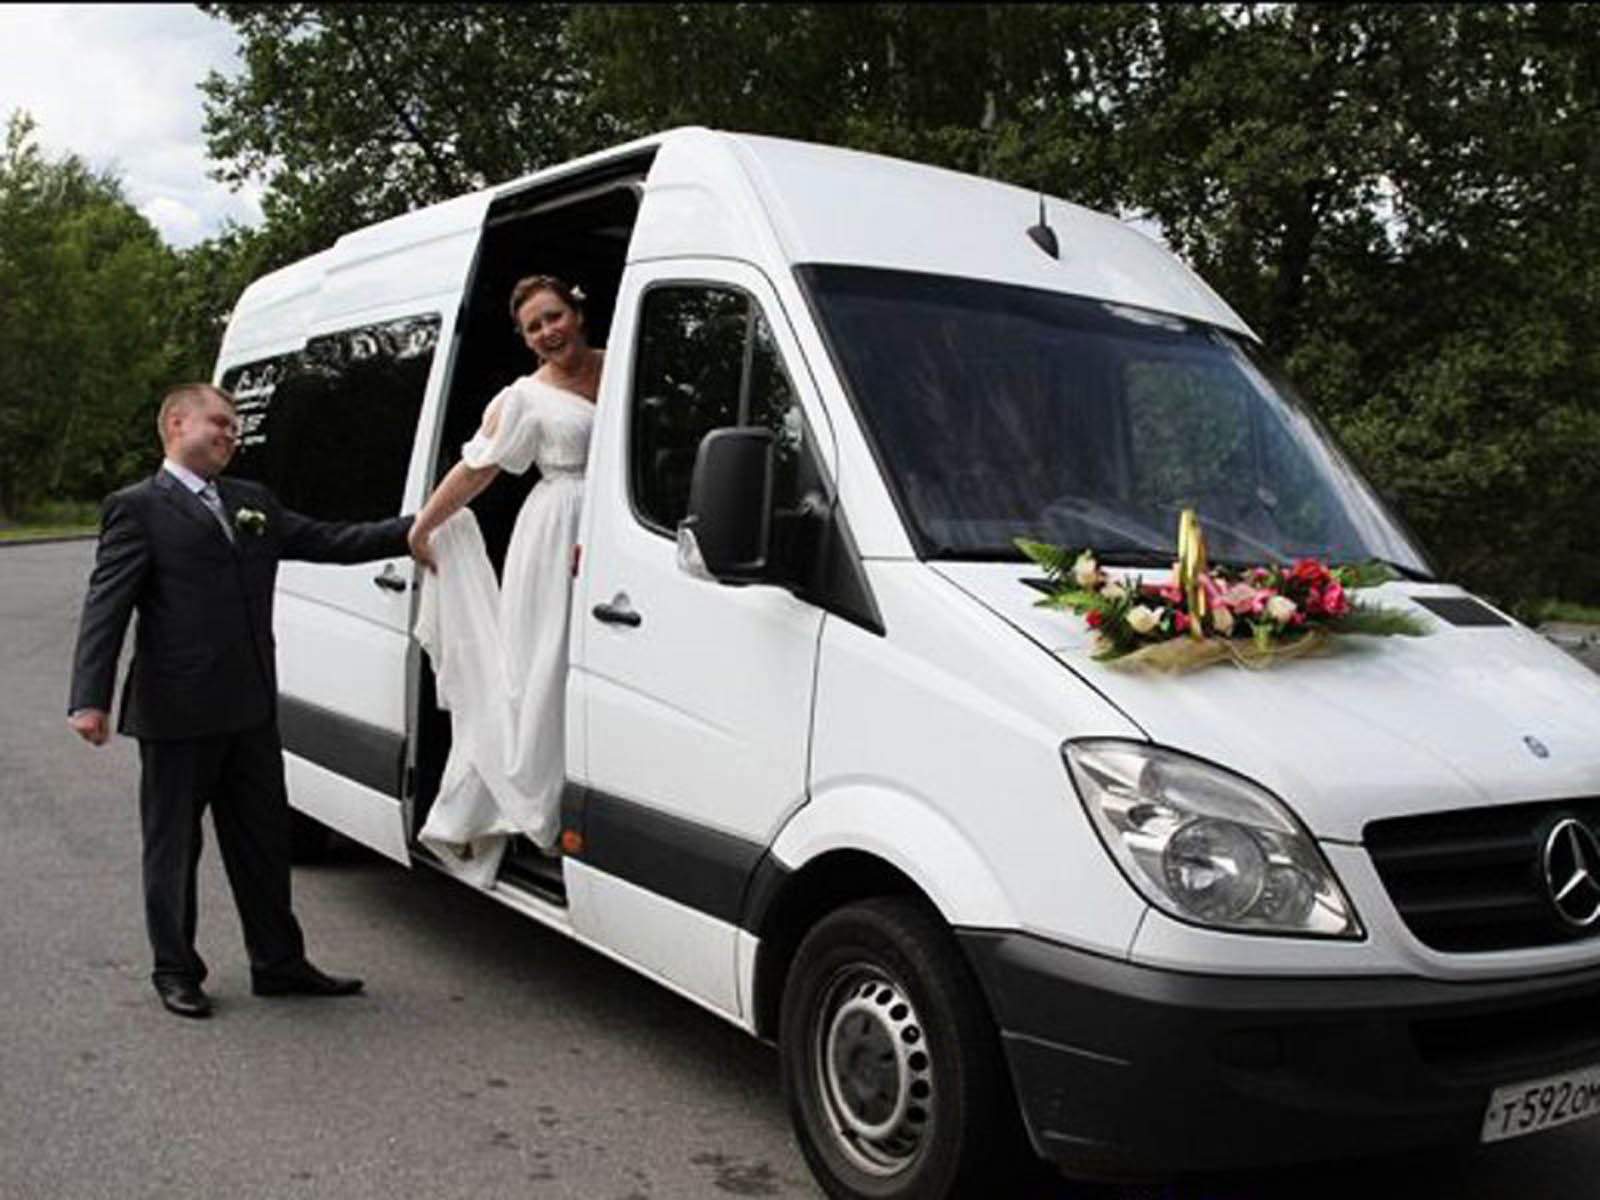 microautobus